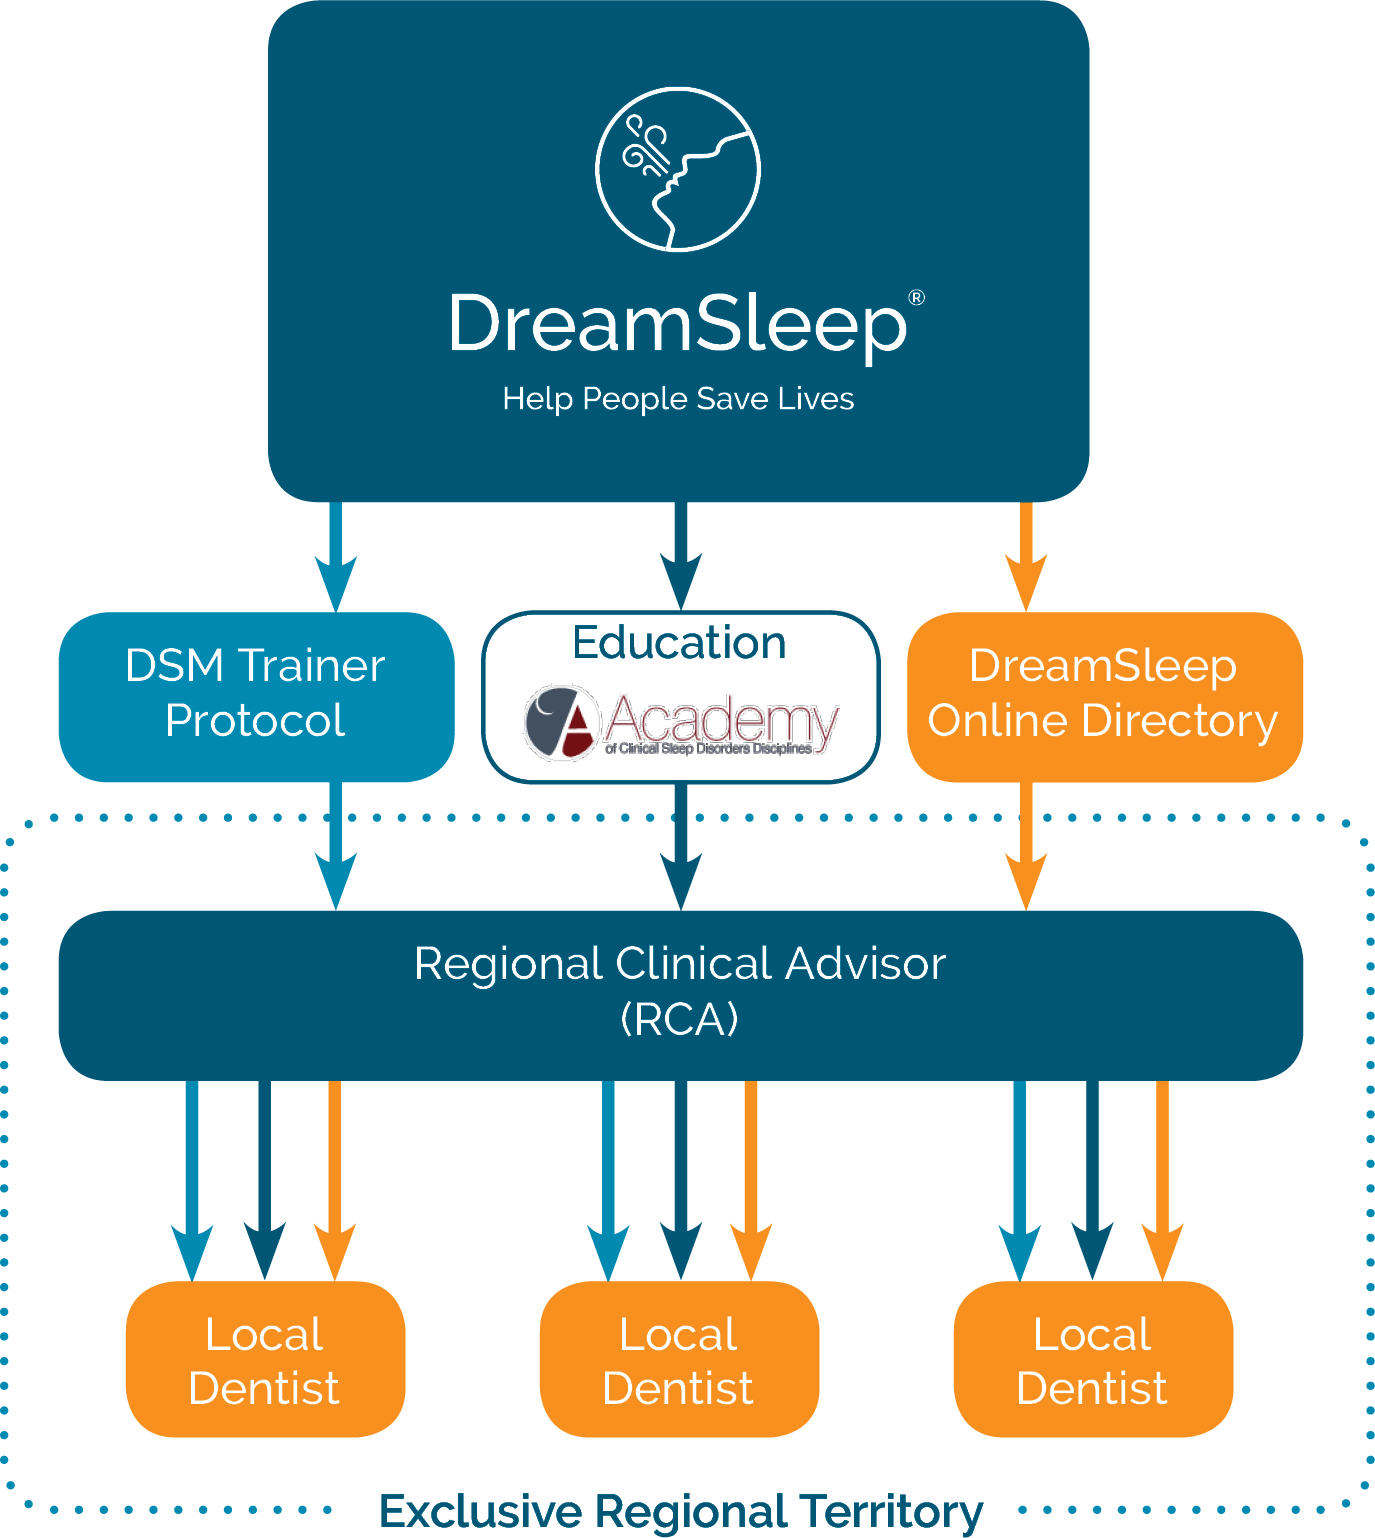 Building the DreamSleep International Network: Proven Methodology + Local Clinical Advisor